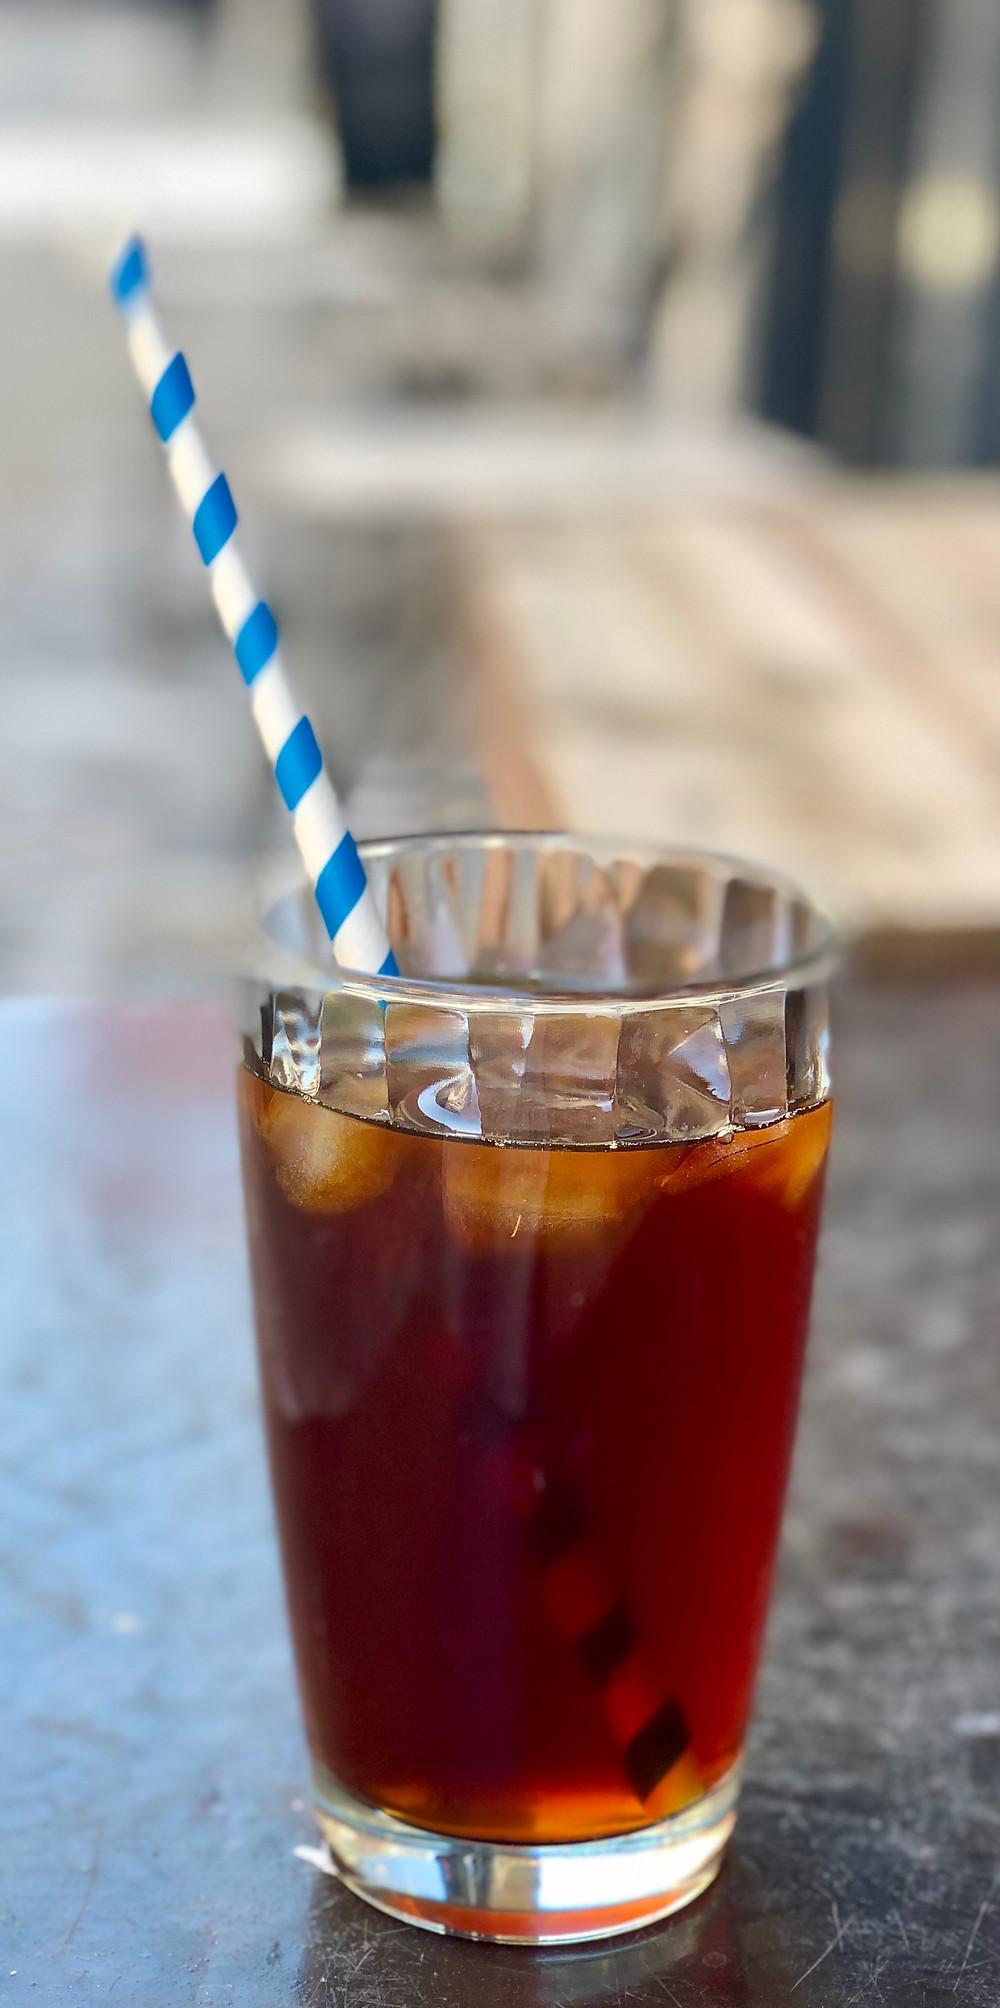 Iced Coffee at Kaffee-Ine Mechelen